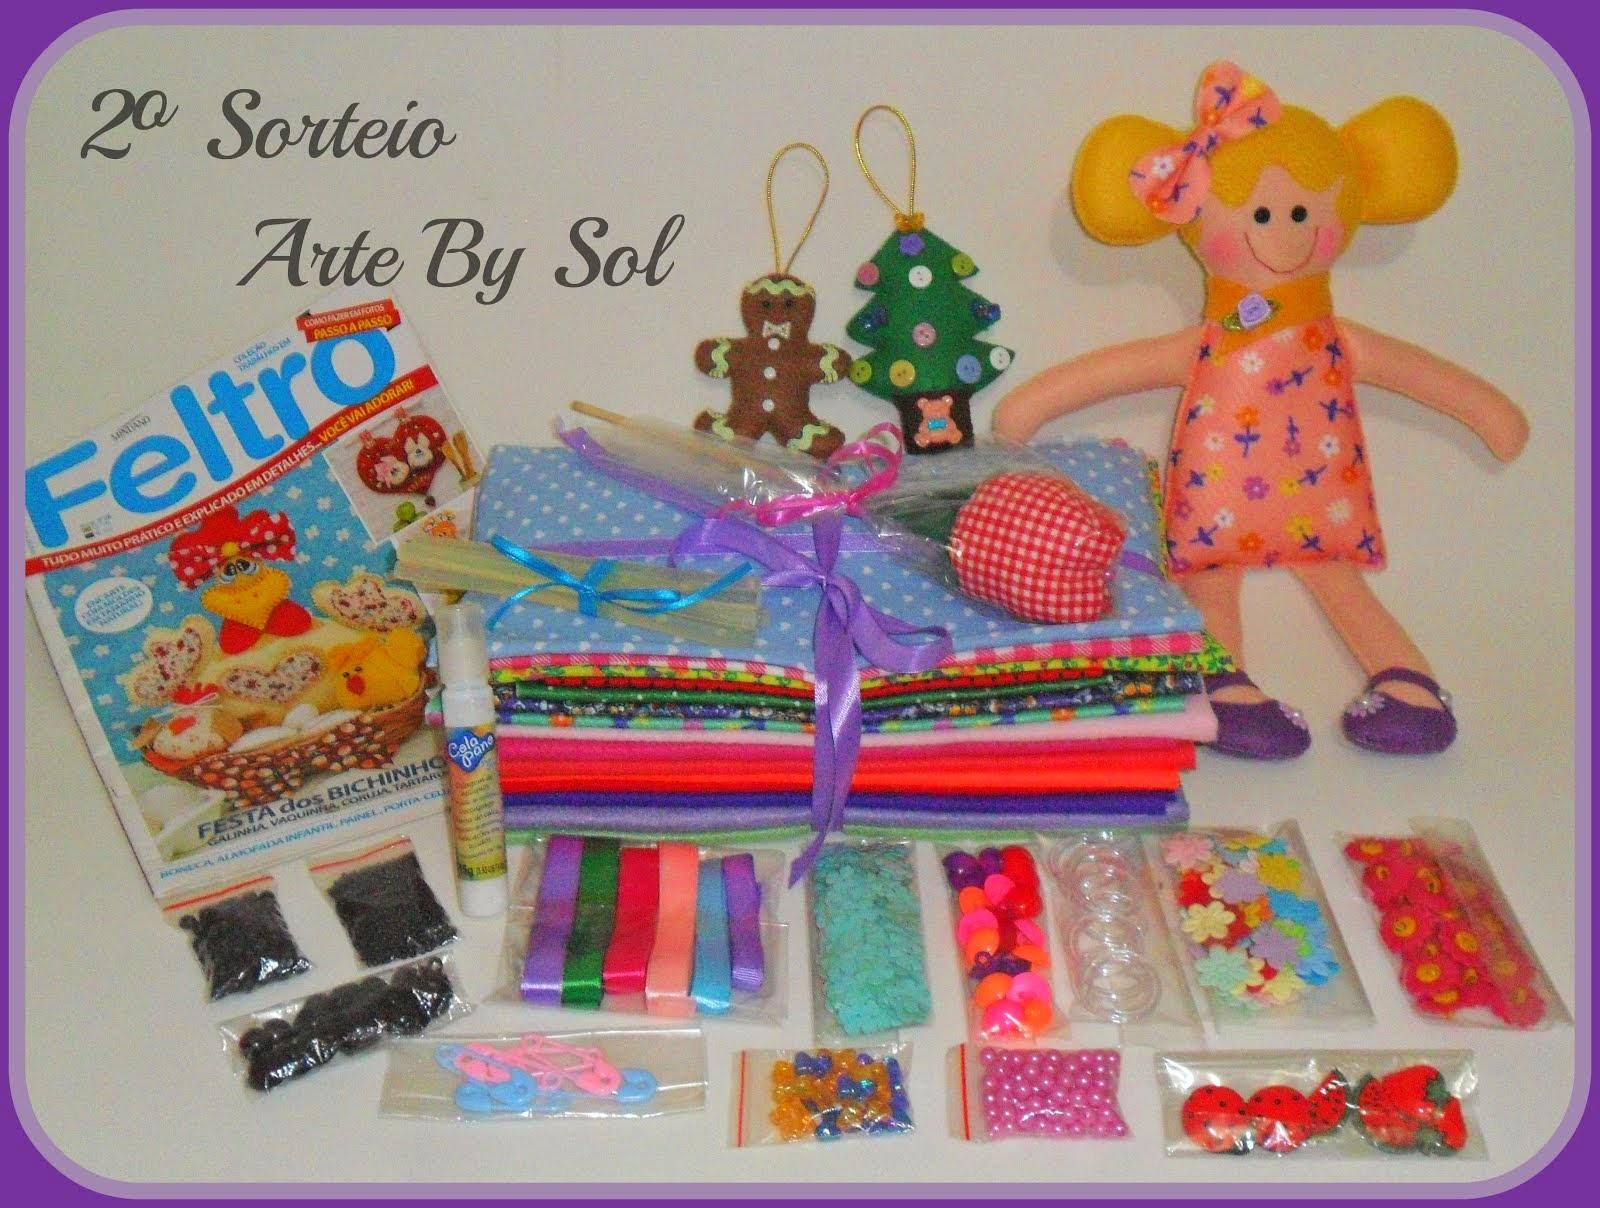 2º sorteio Arte By Sol